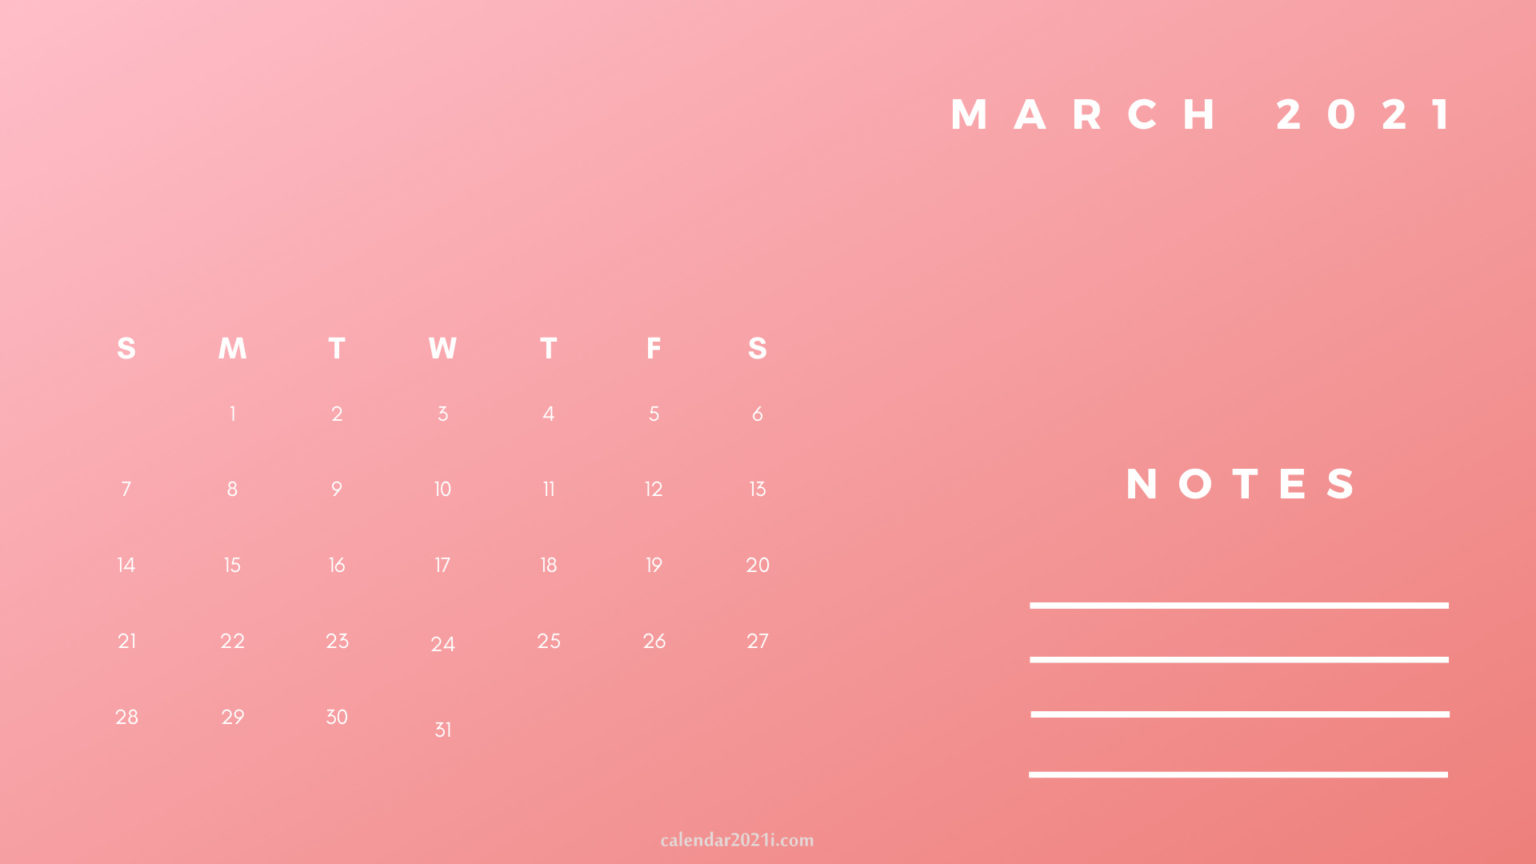 March Printable 2021 Planner Calendar